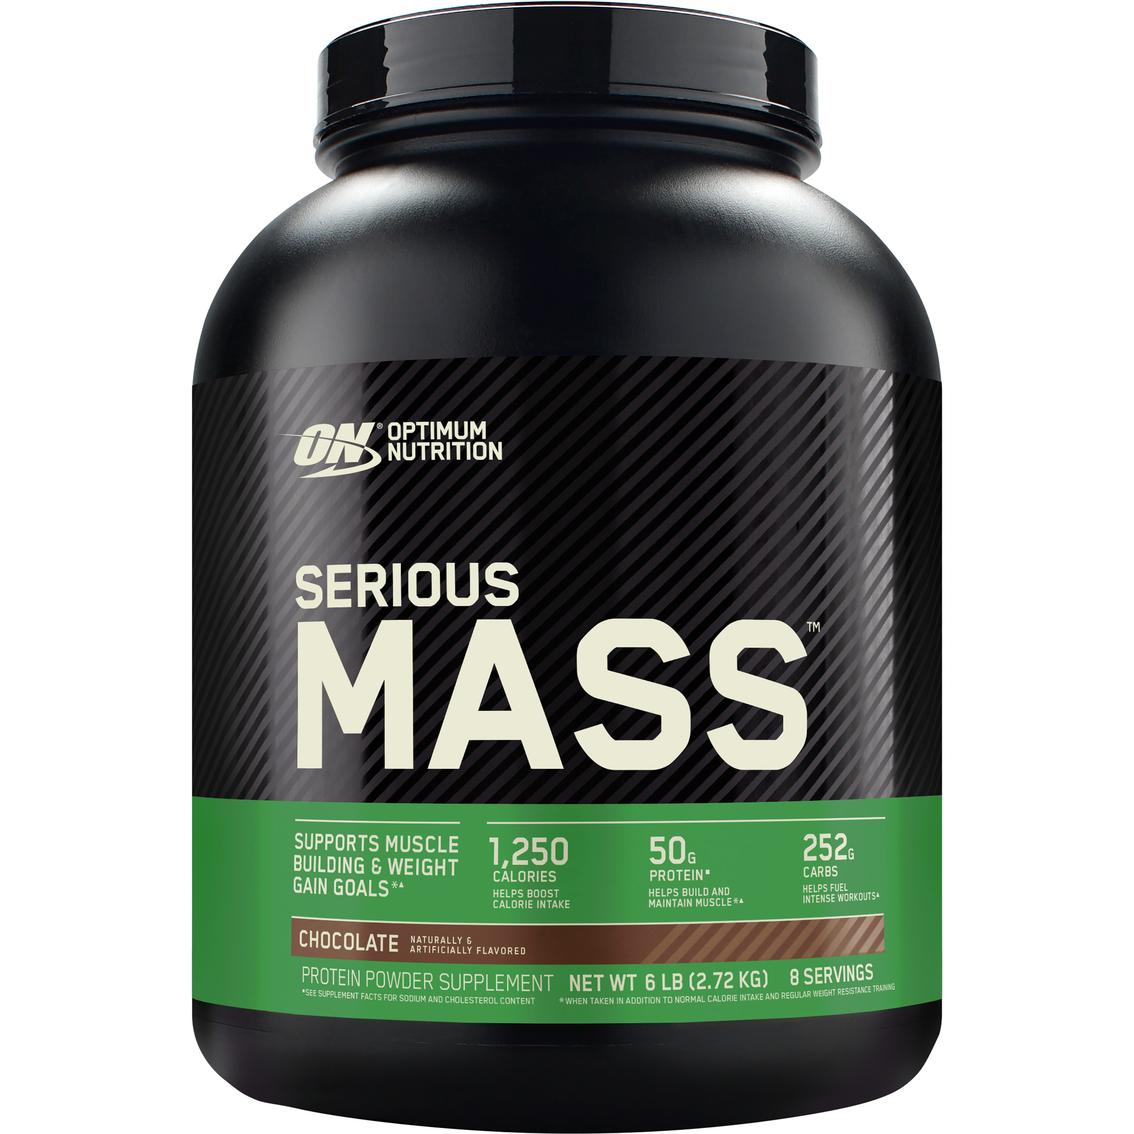 Optimum Nutrition Serious Mass Supplement 6 Lb Protein